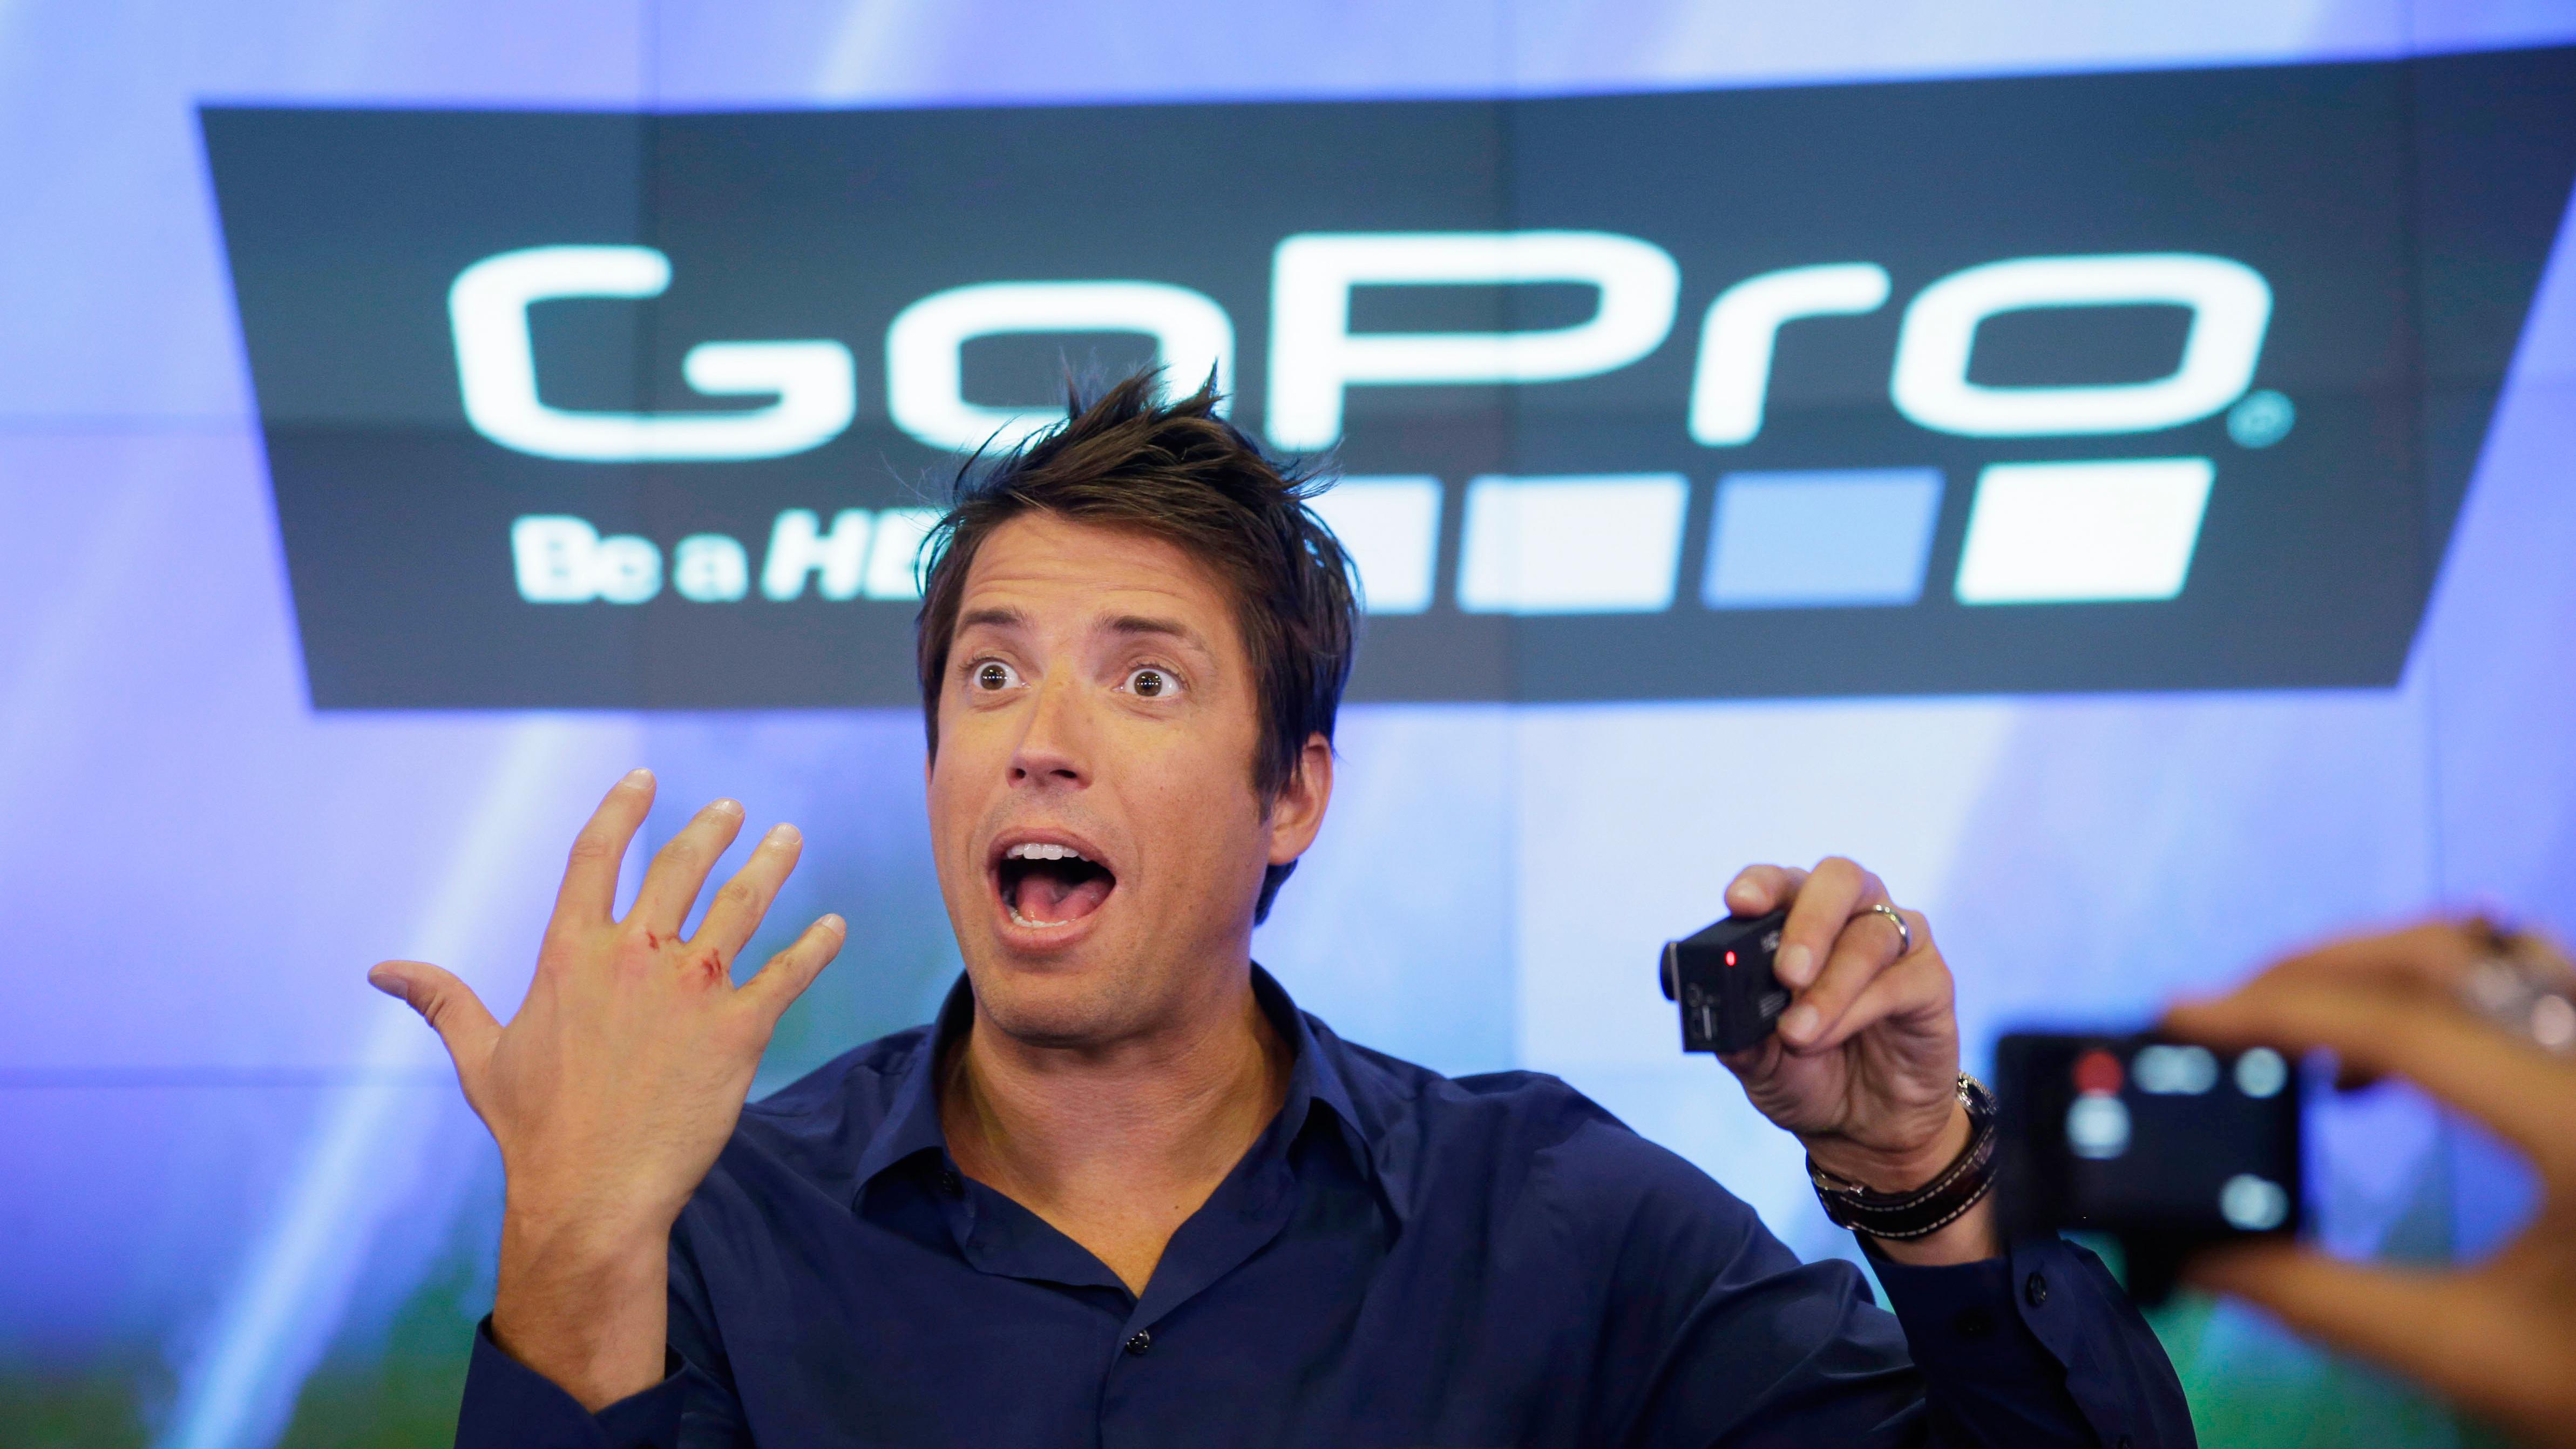 GoPro CEO Nick Woodman.